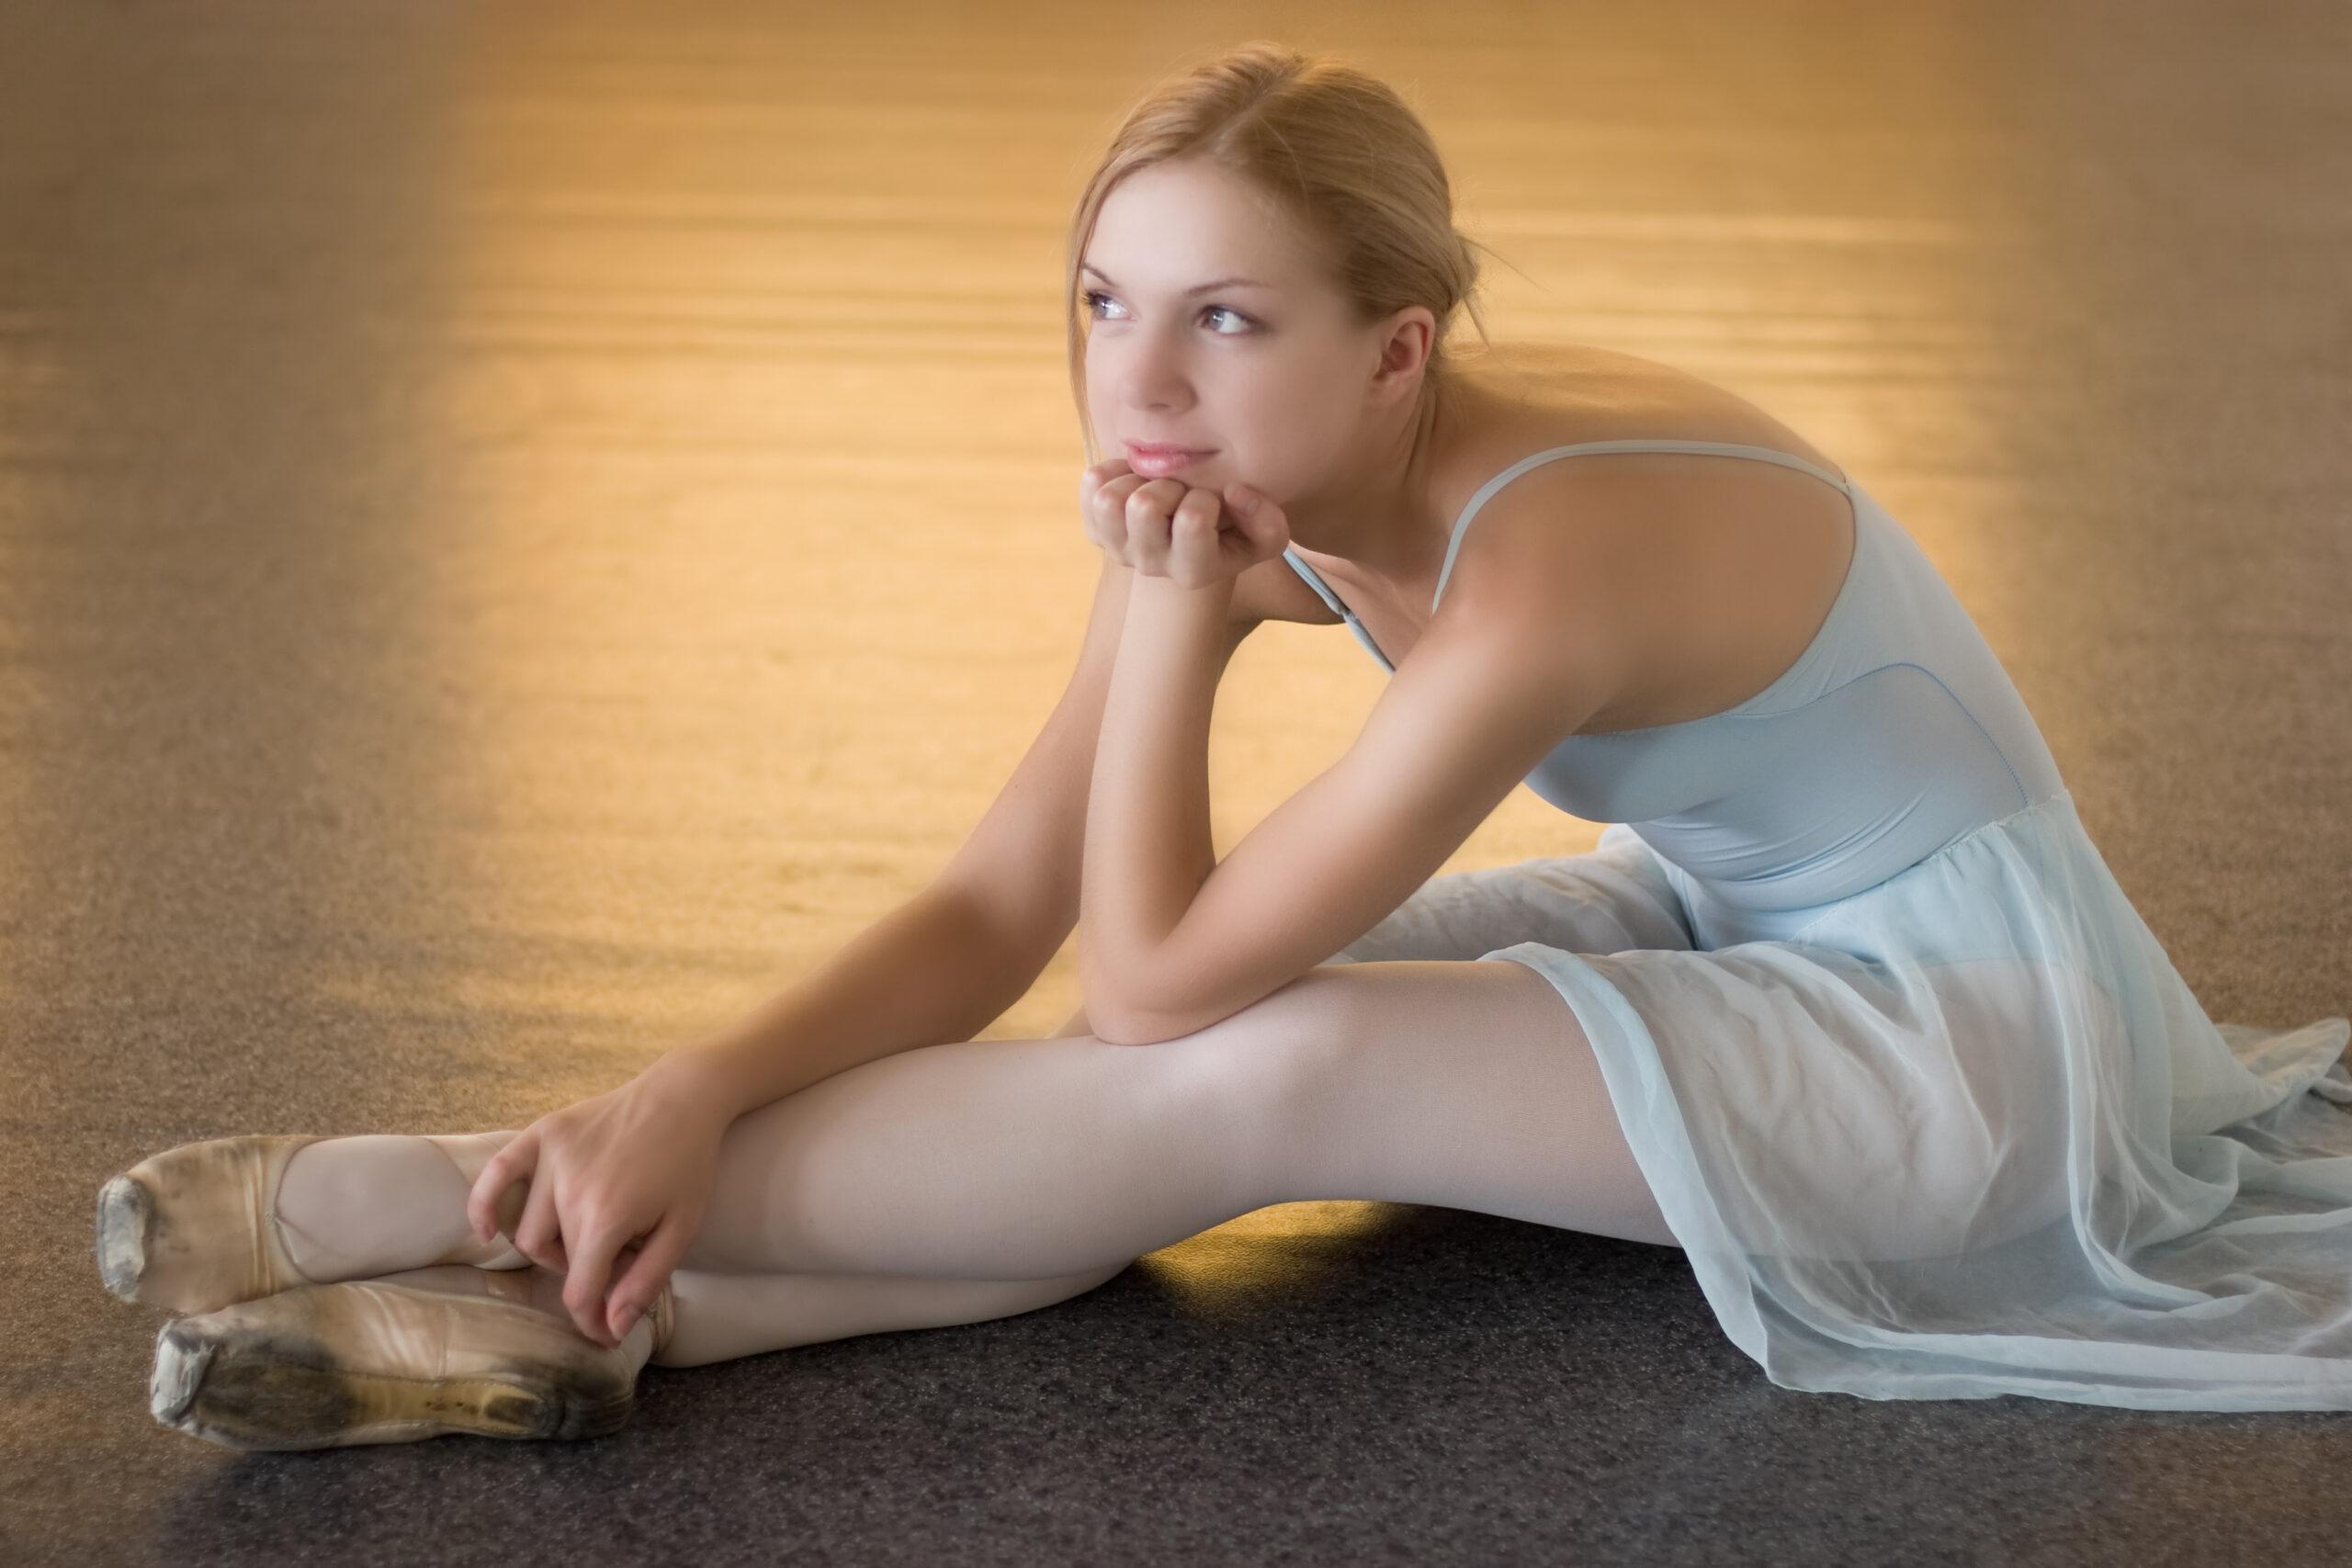 bored ballerina is siting on the floor